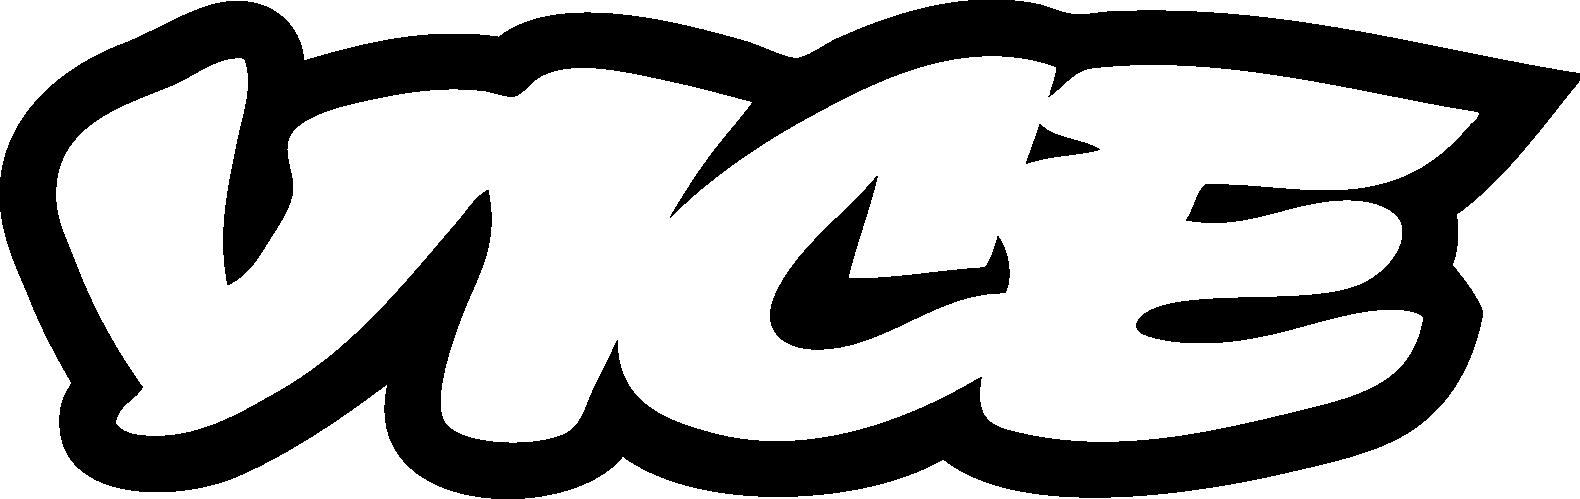 Vice_Logo big.png